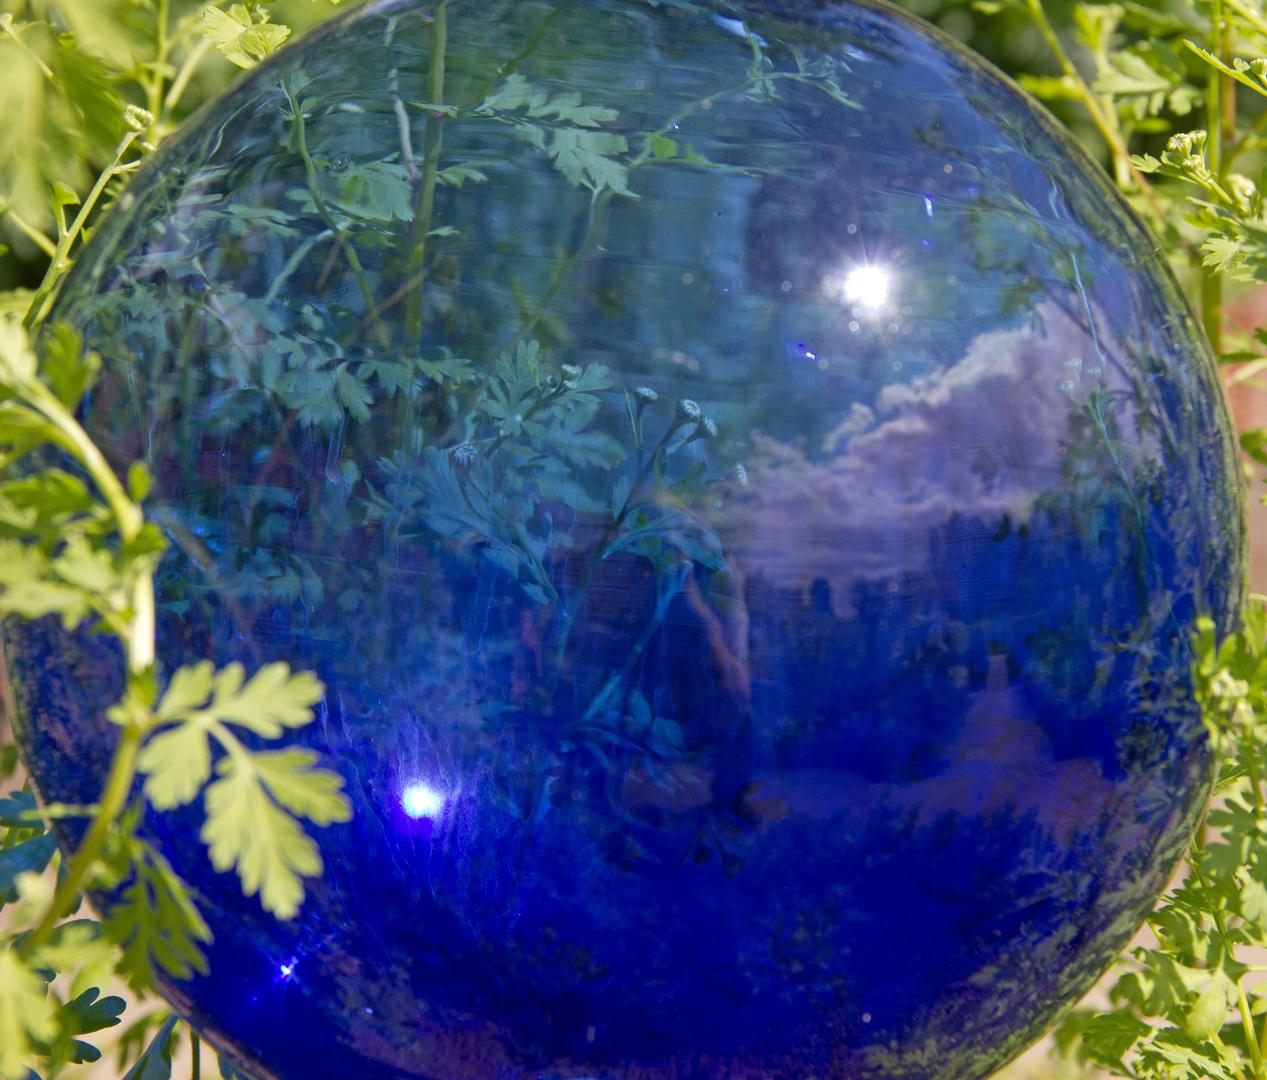 Blau im Grünen